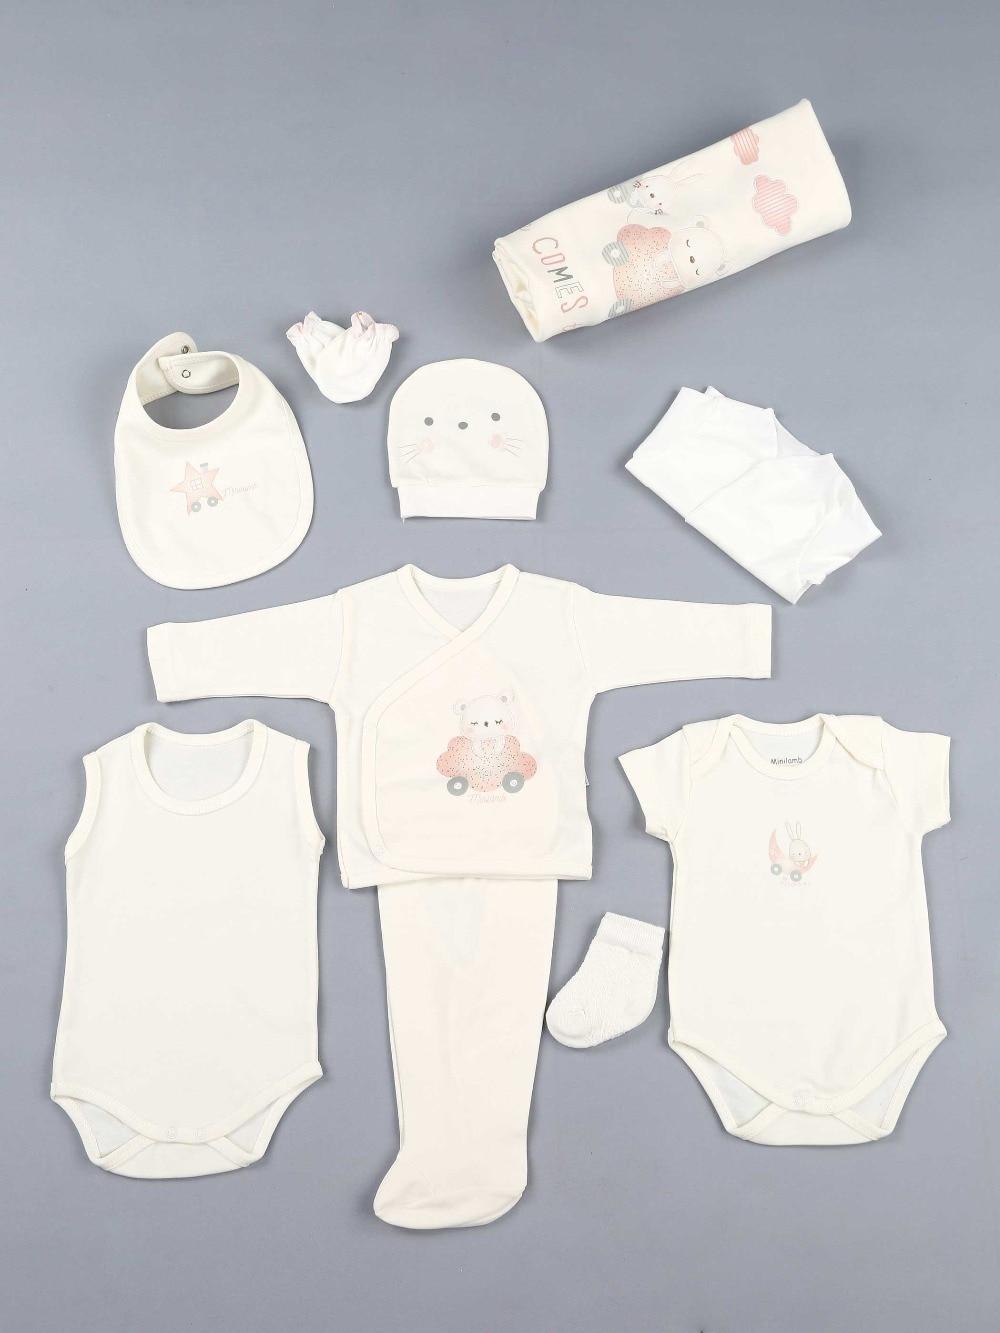 078-17003-021 Pembe 10 lu Kız Bebek Hastane Çıkışı (1)